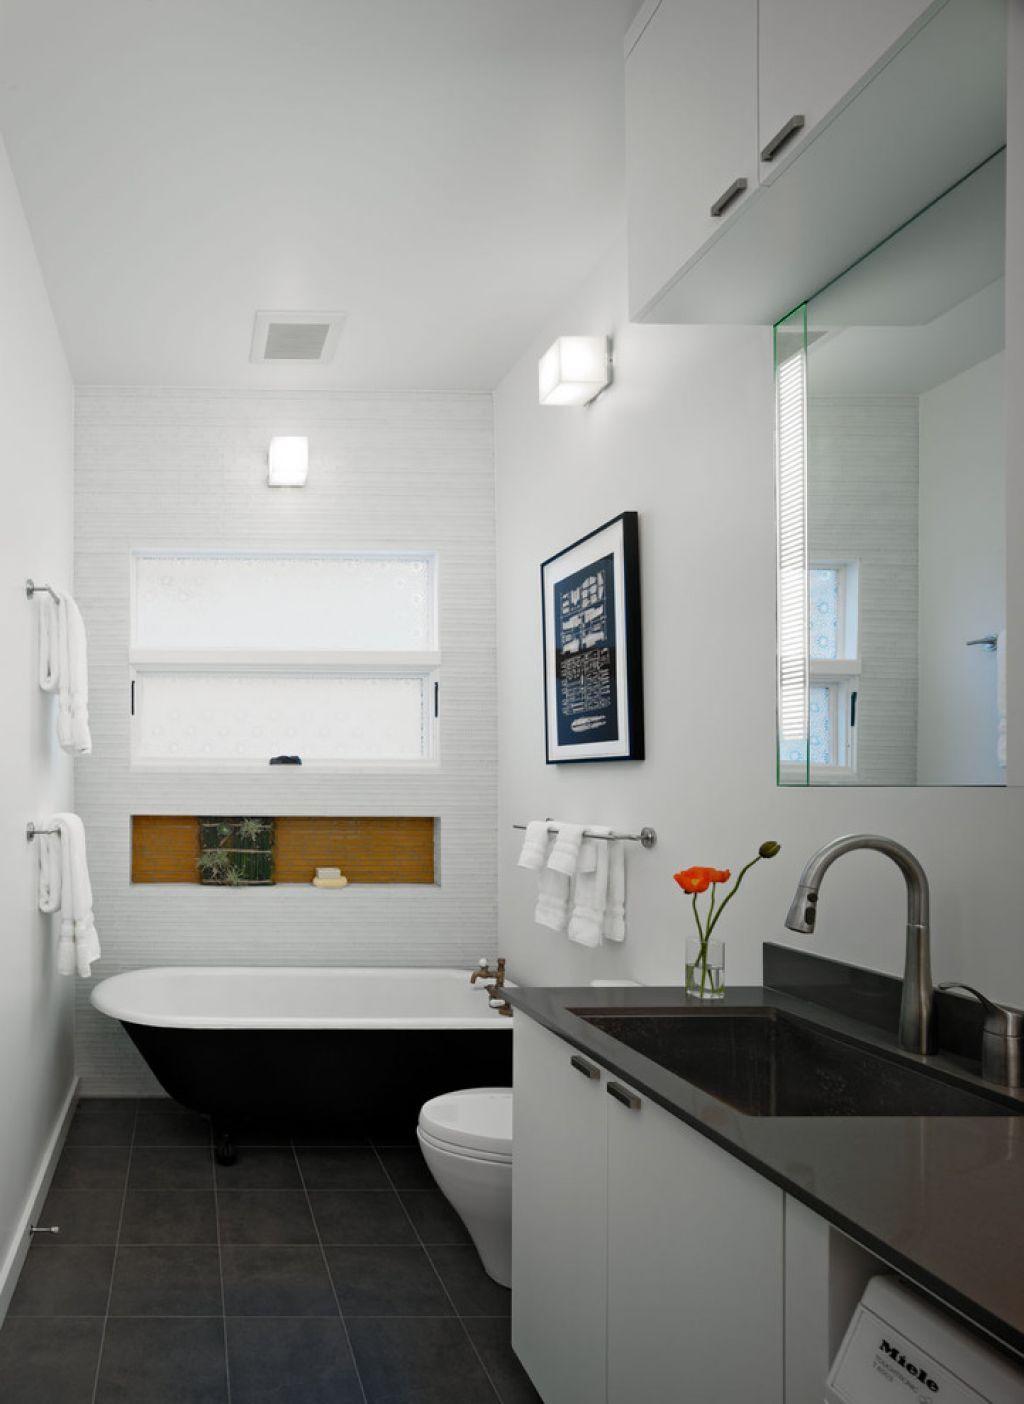 Small Narrow Bathroom With Black Clawfoot Tub Small narrow